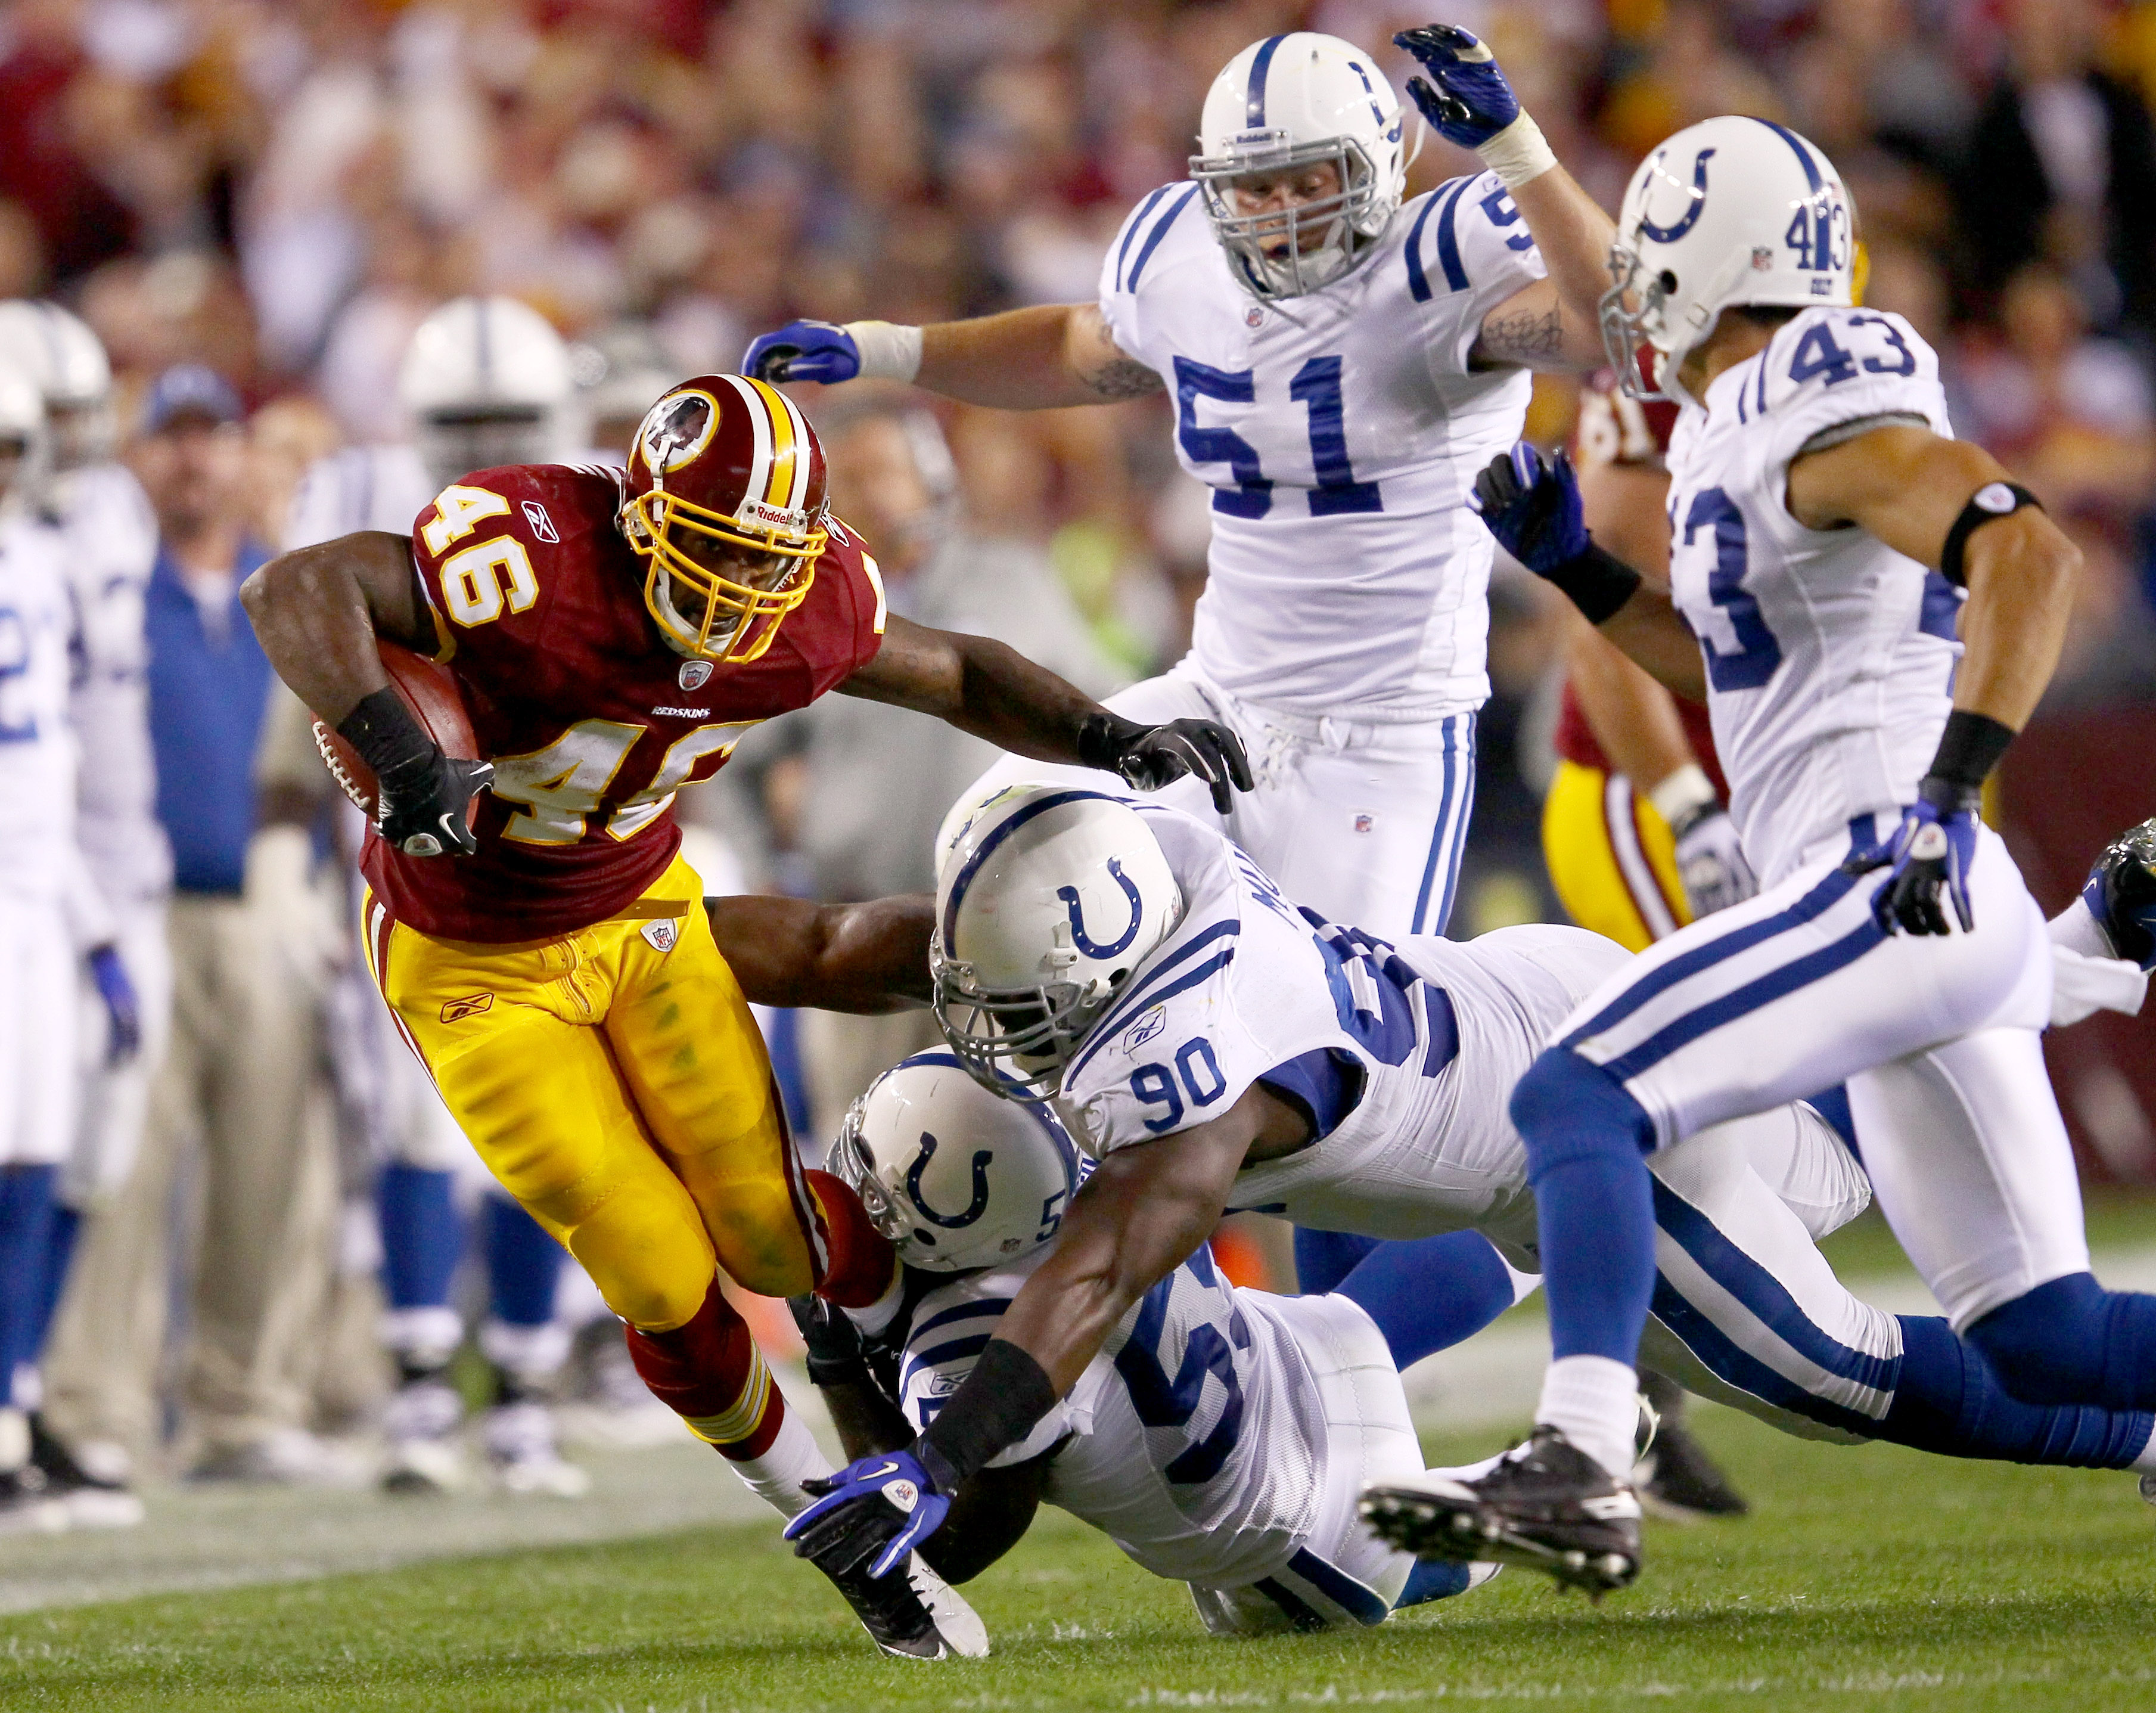 Redskins running back Ryan Torain